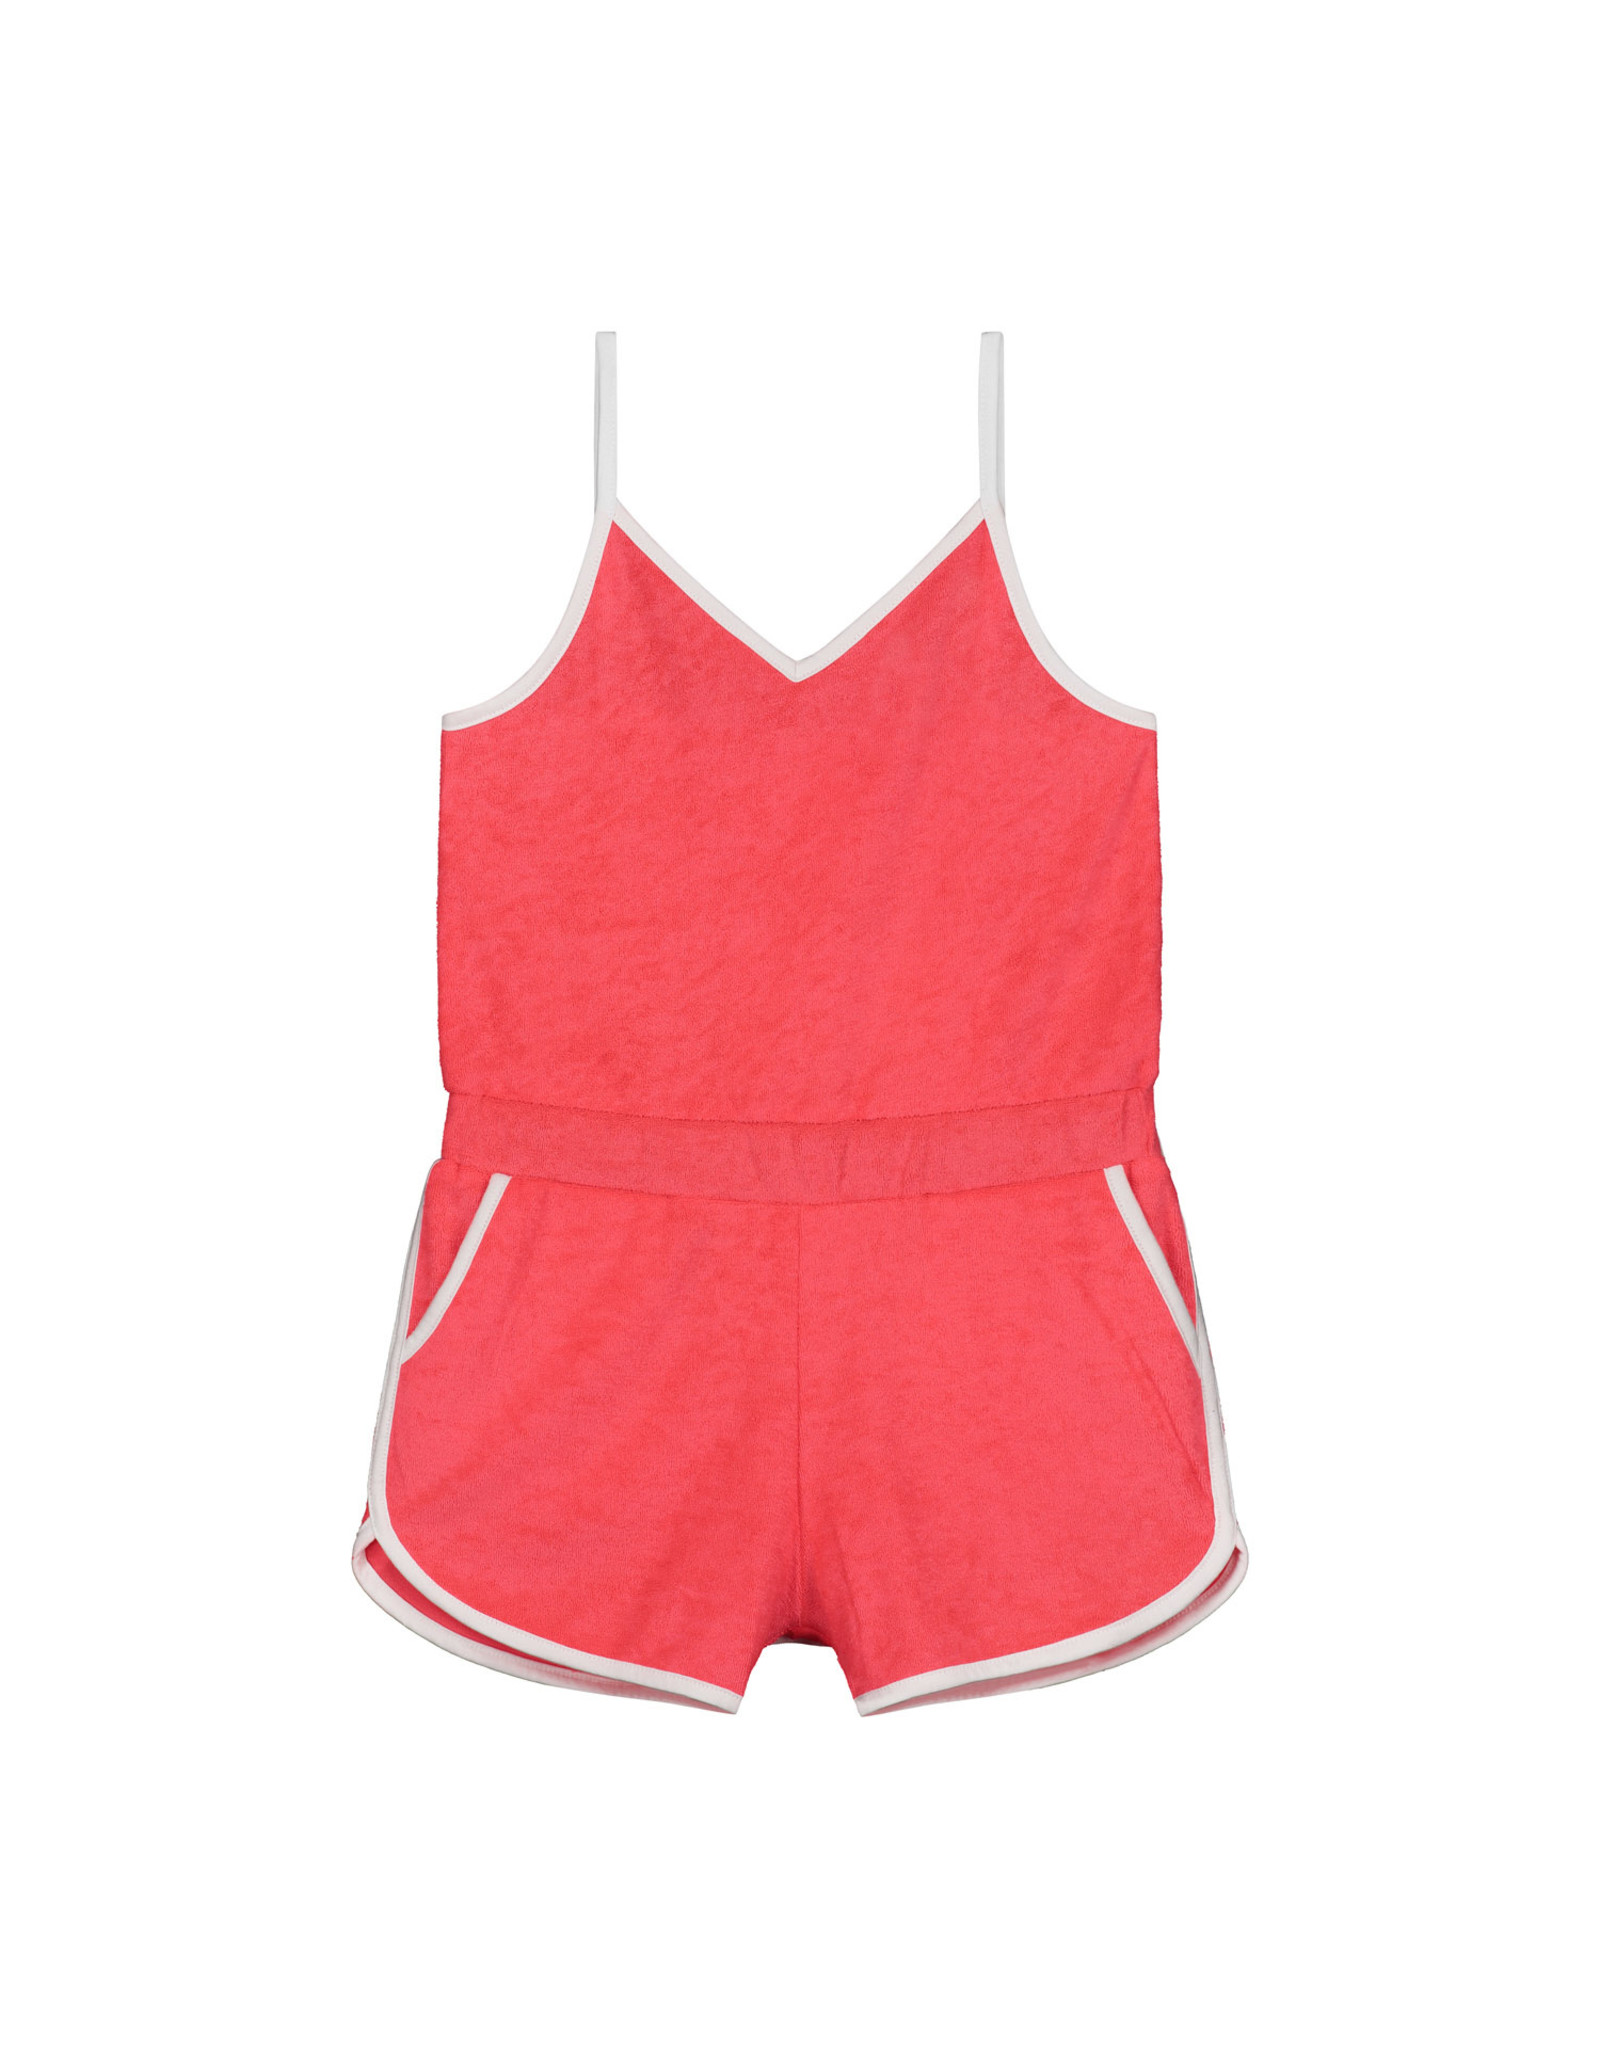 Shiwi girls braga jumpsuit fluo red